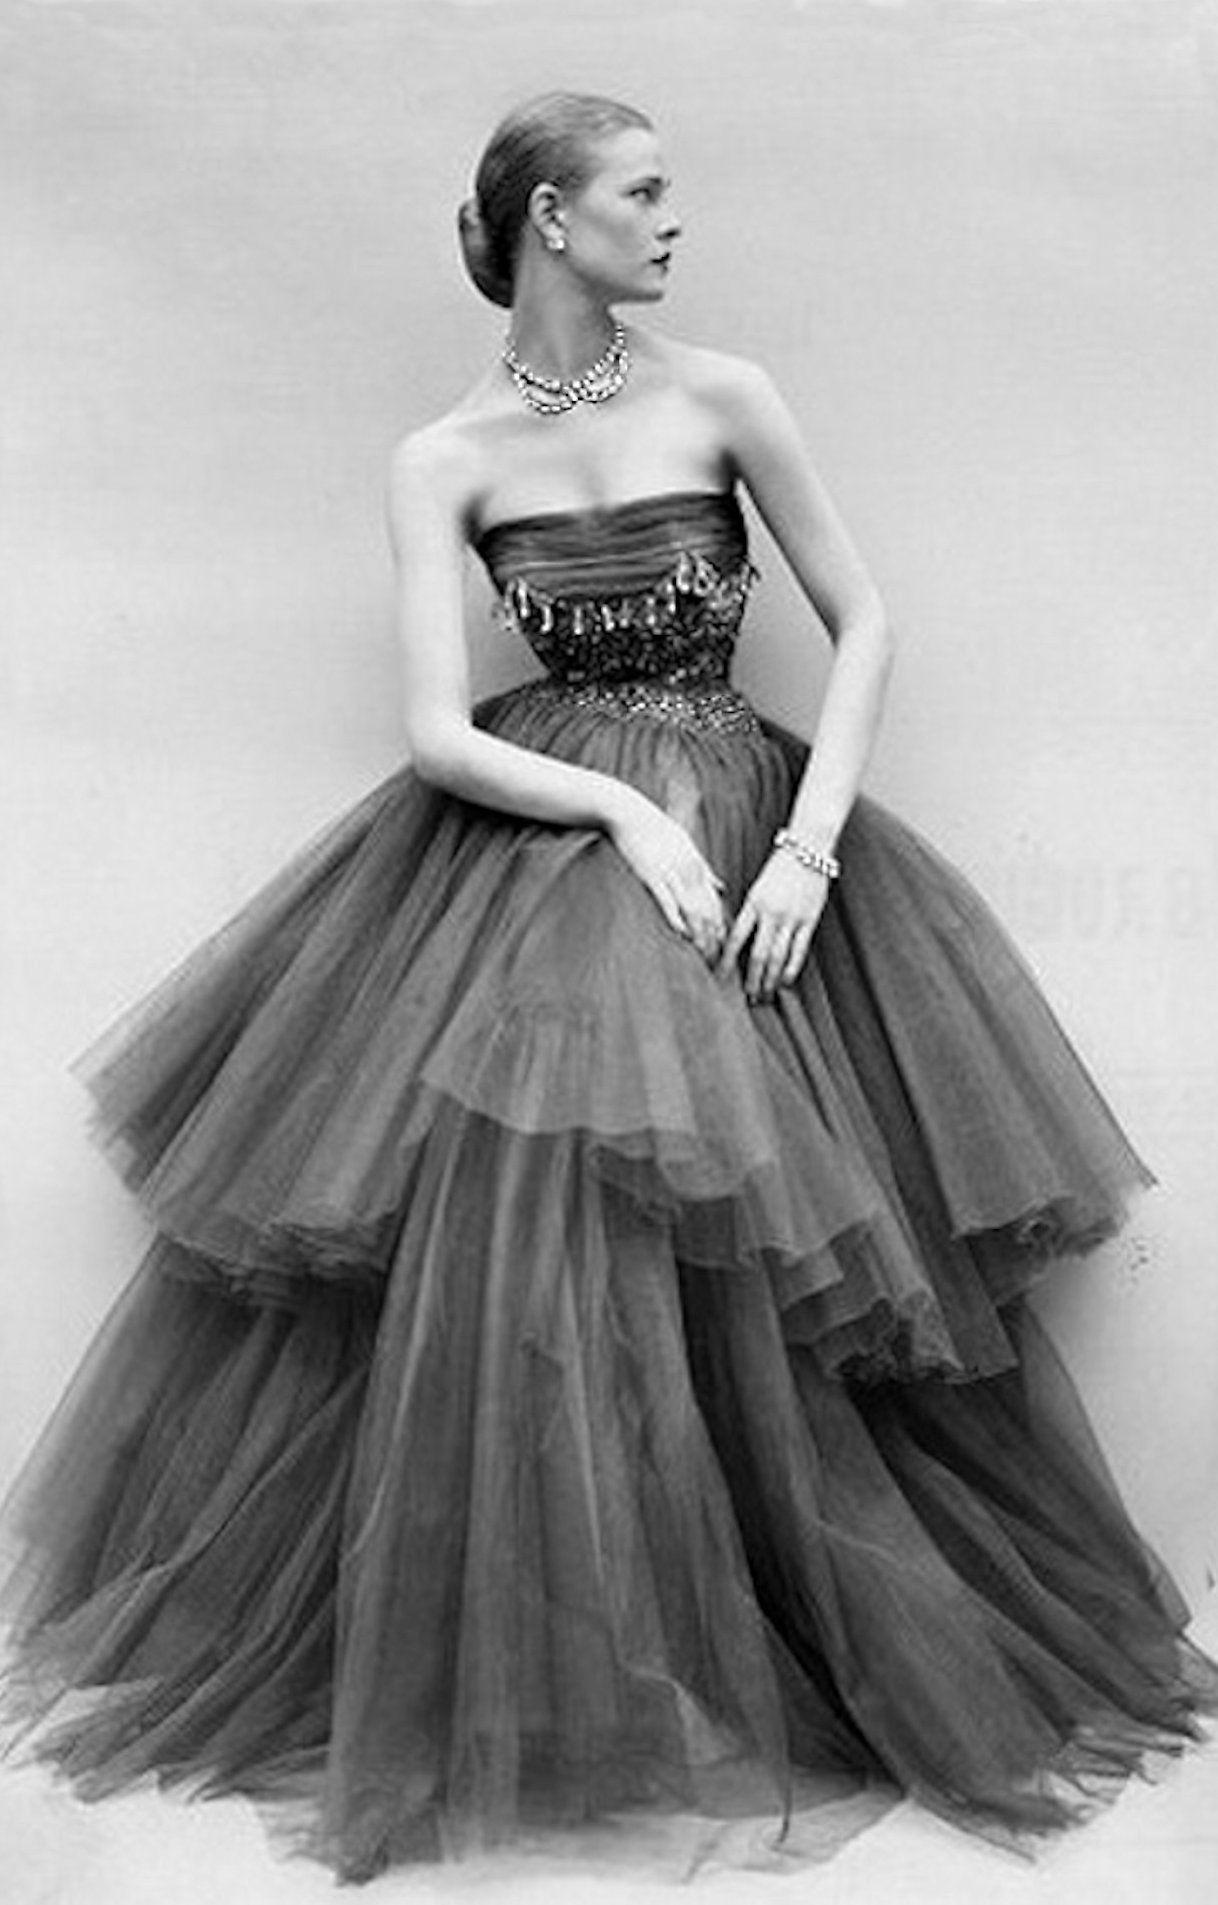 Susan abraham us photo by don honeyman this dress is amazing